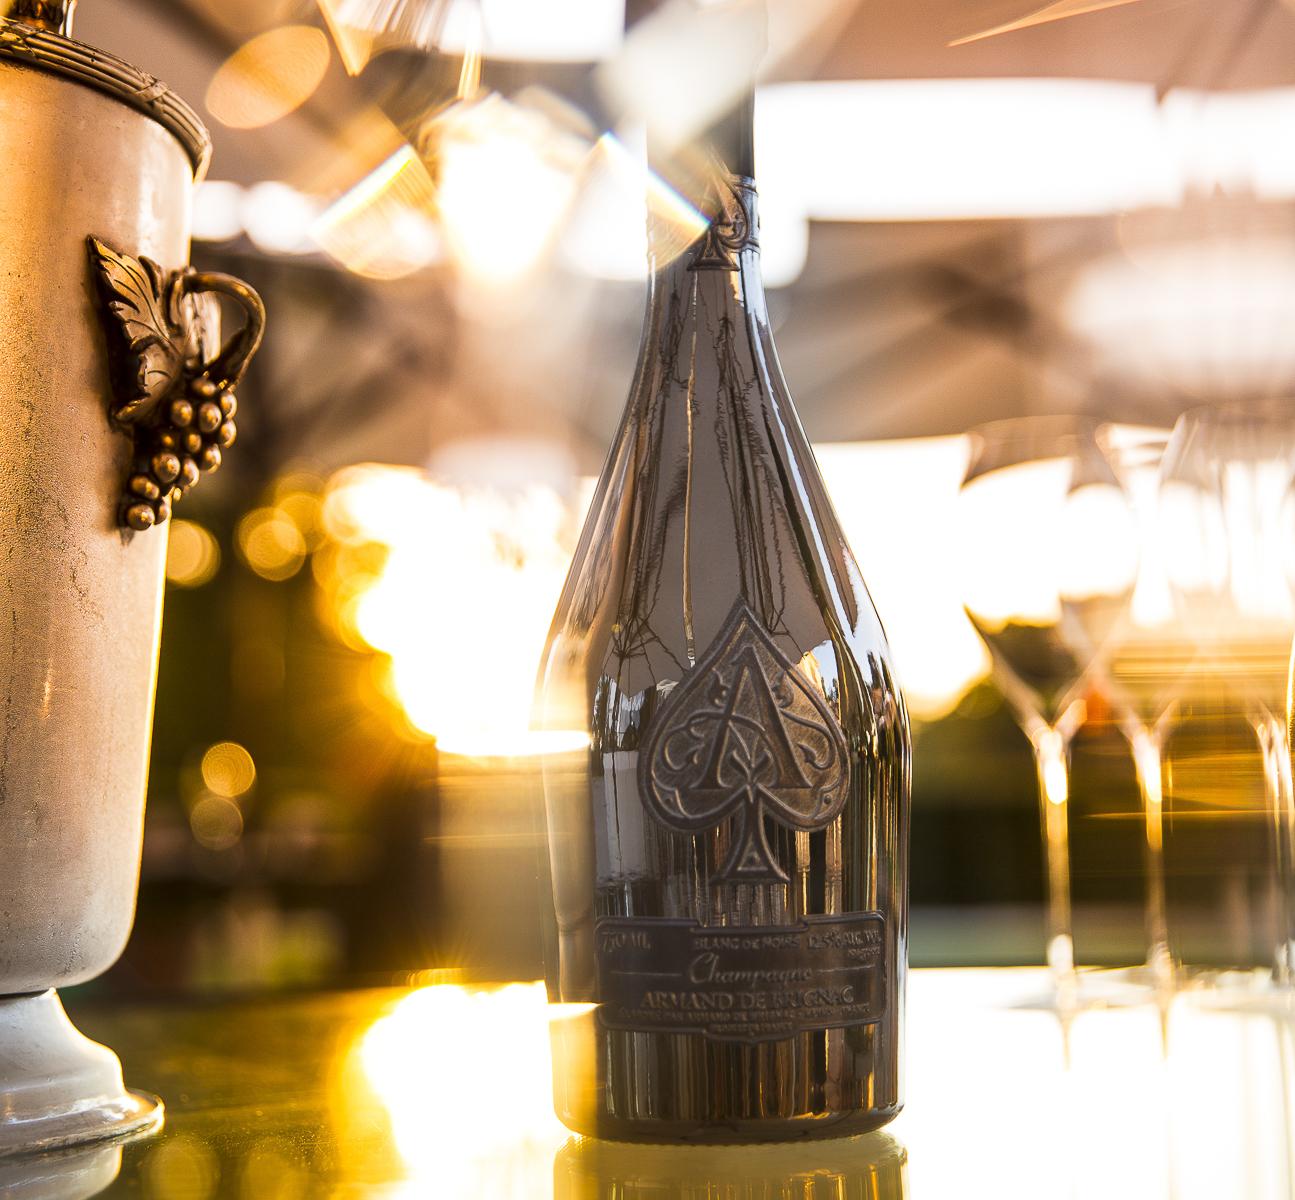 Champagne_Armand_de_Brignac__Reims__August2016_Jerusalmi_00294